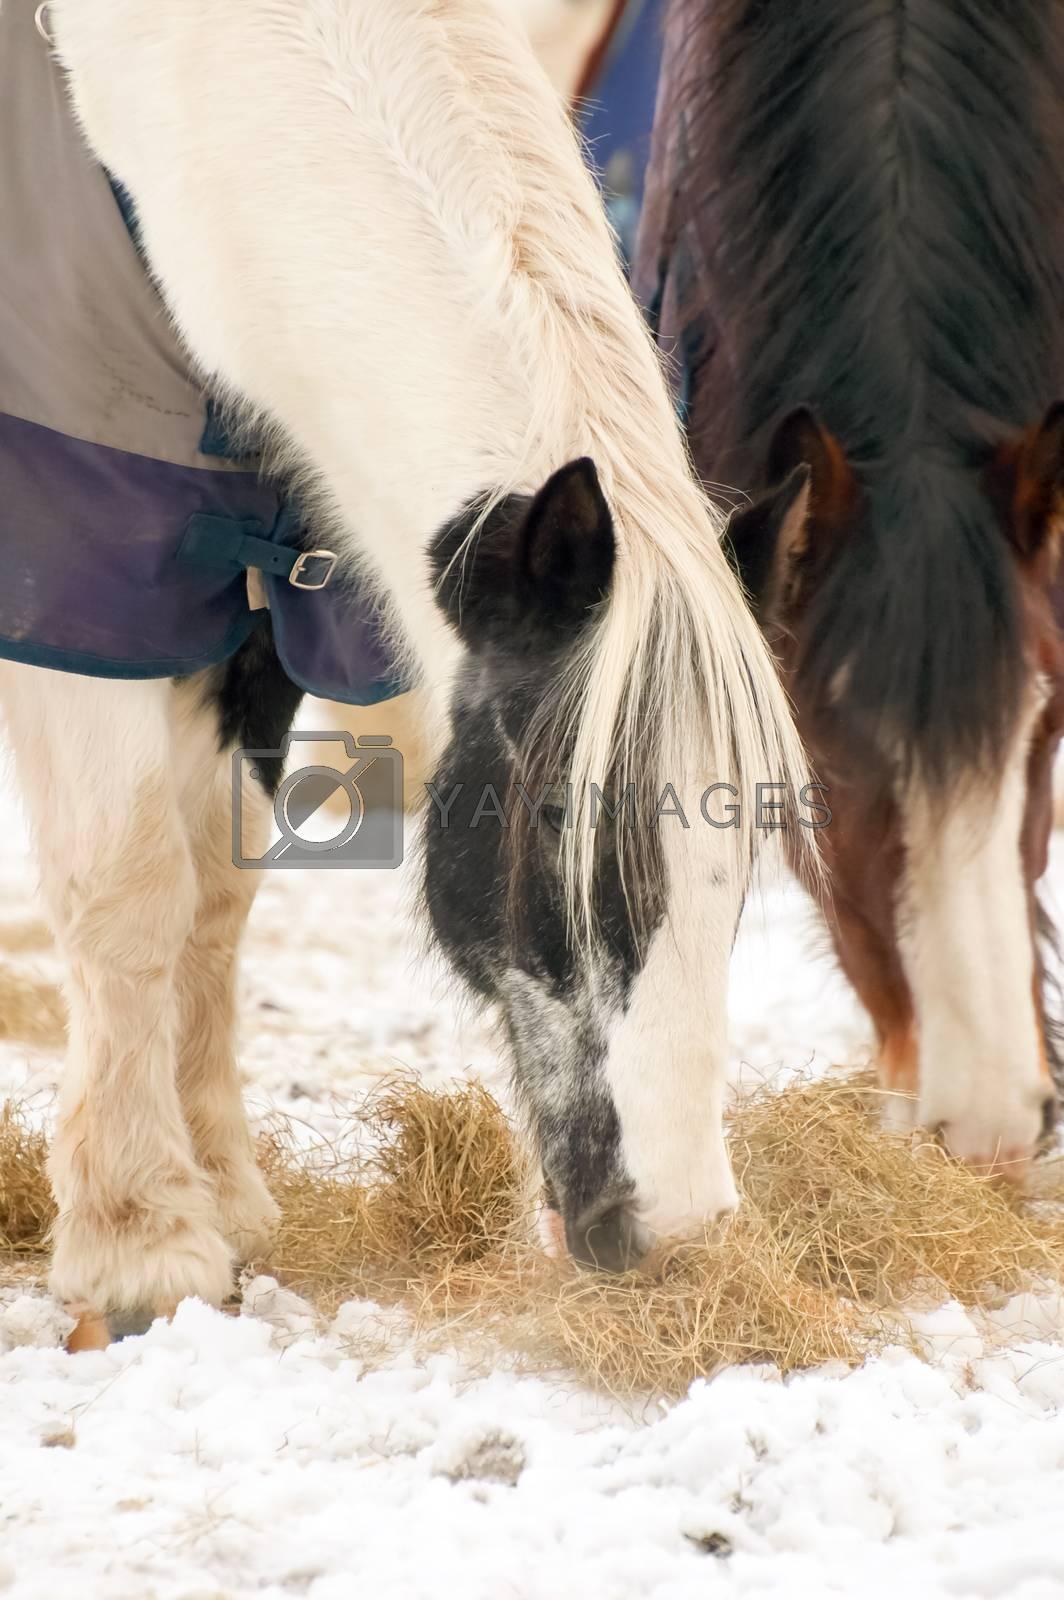 Royalty free image of horses feeding by nelsonart